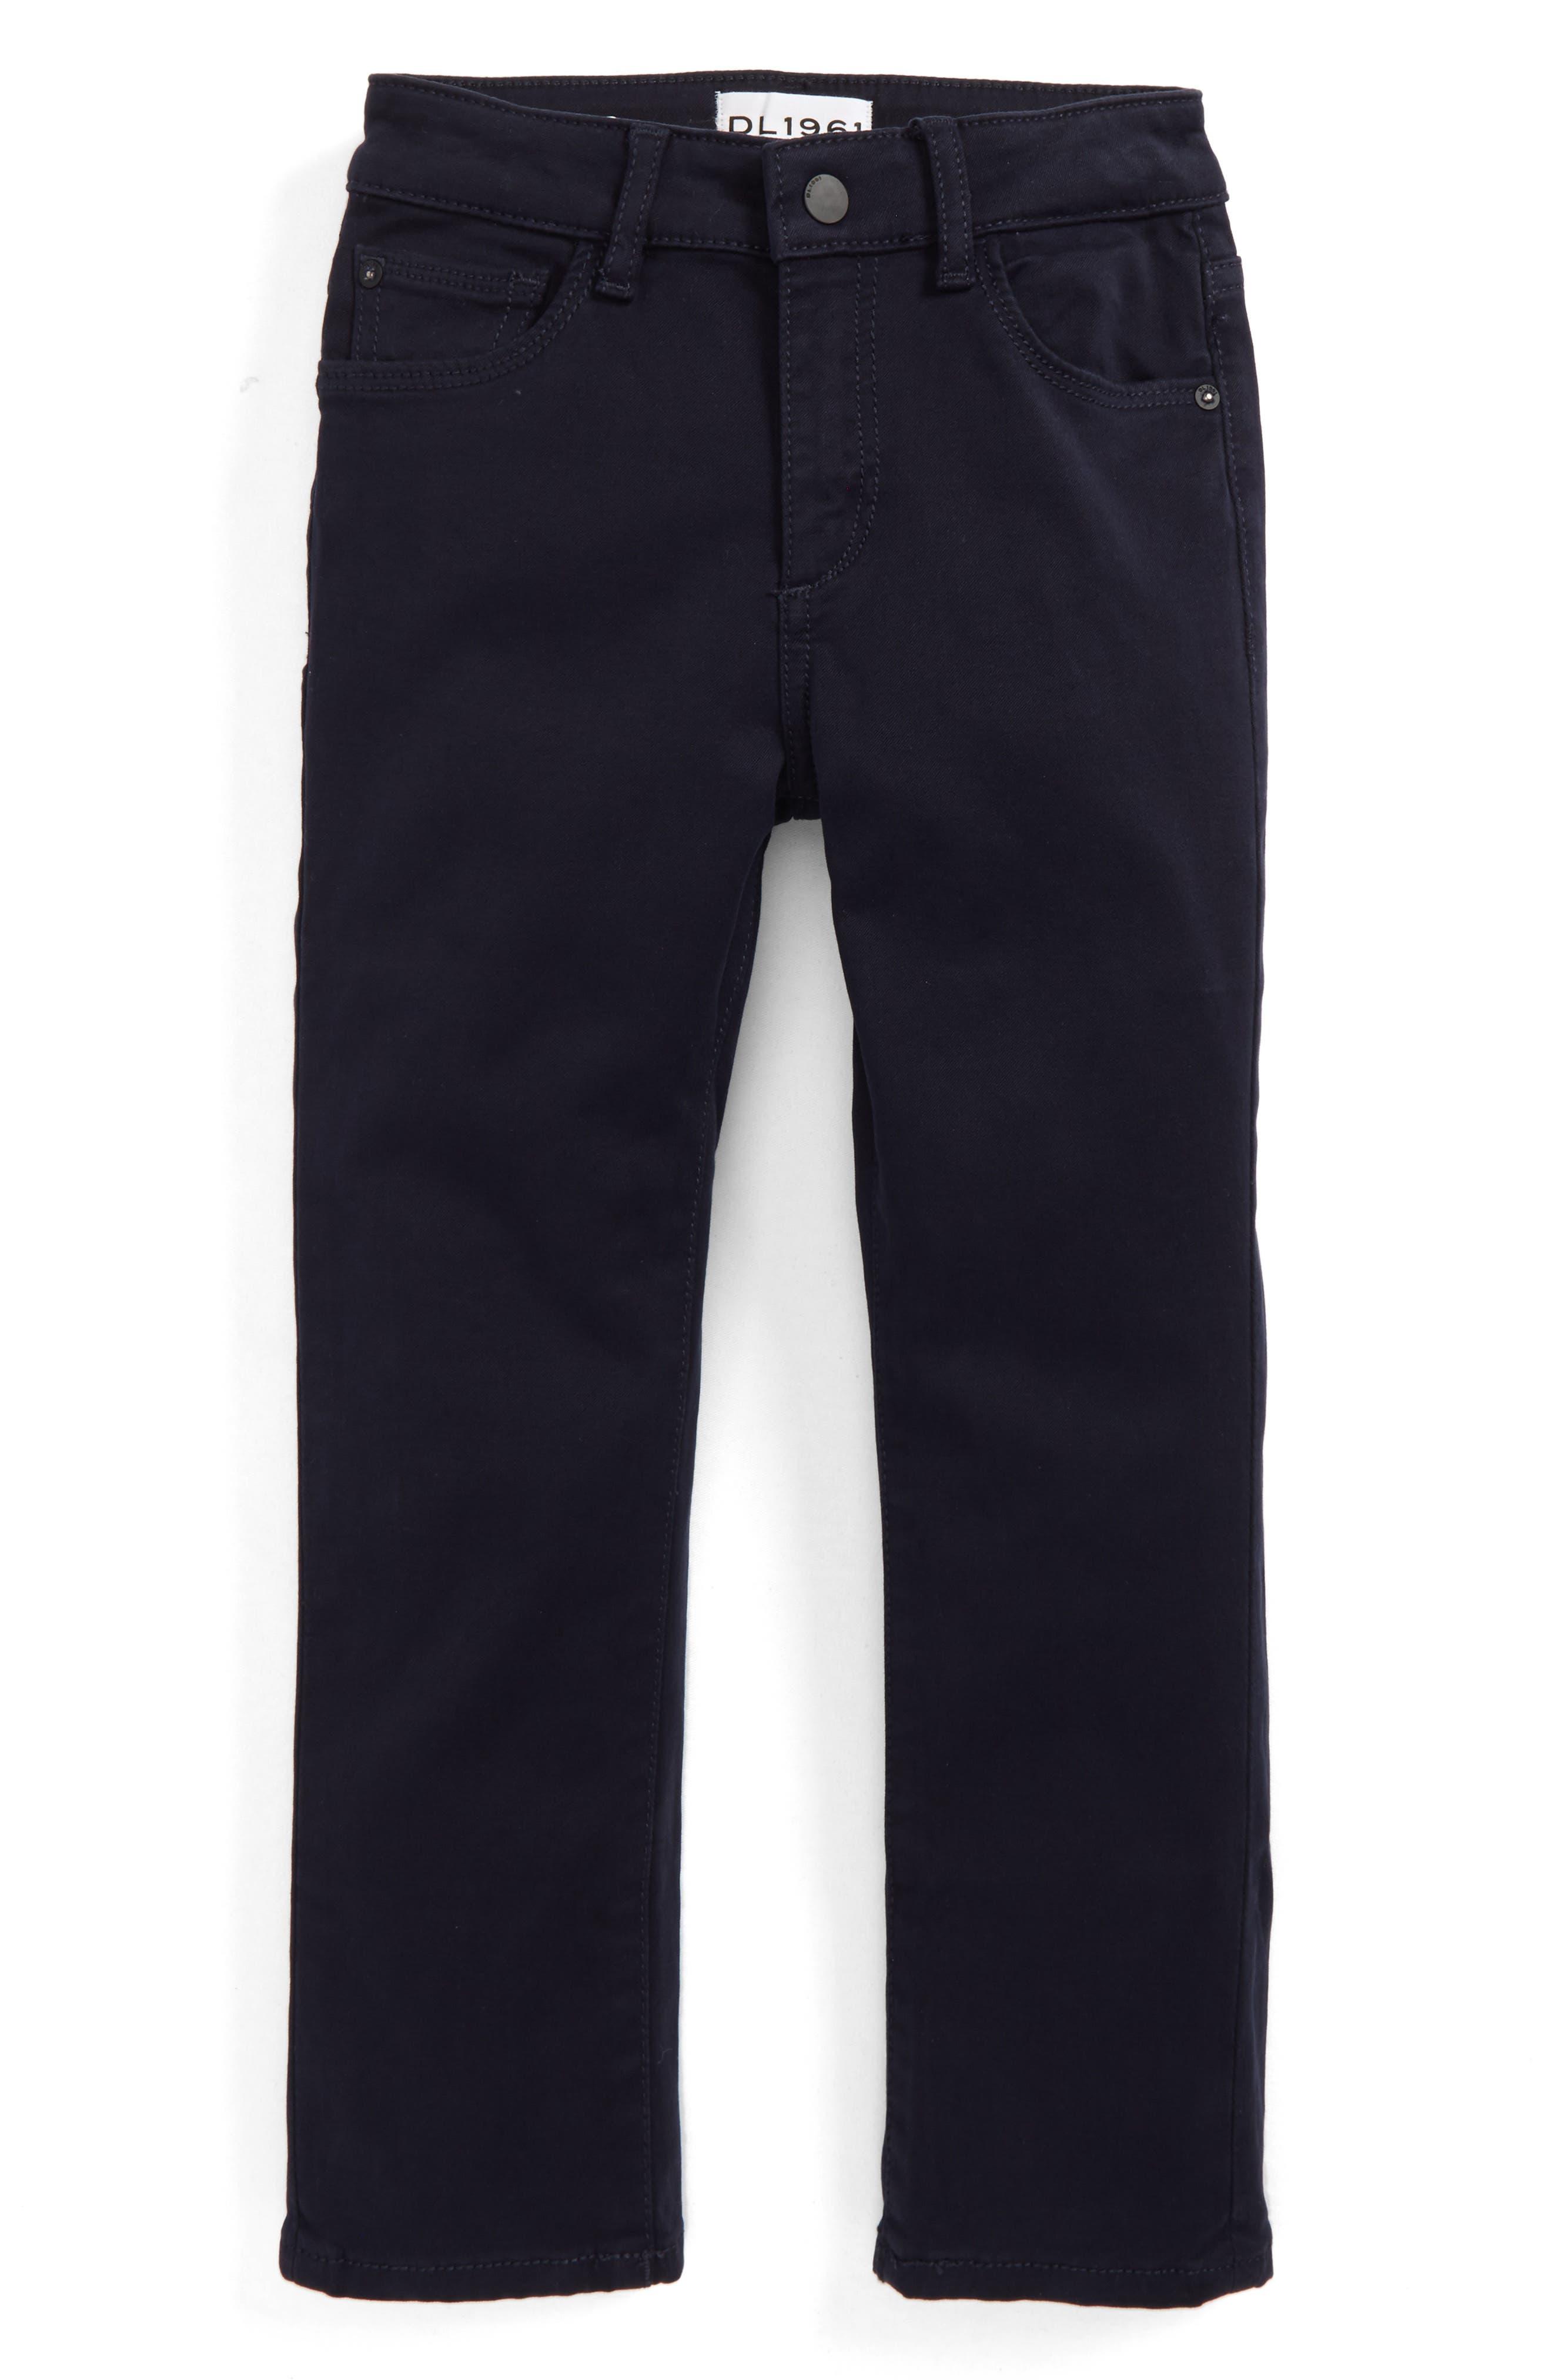 Main Image - DL1961 Brady Slim Fit Twill Pants (Toddler Boys & Little Boys)